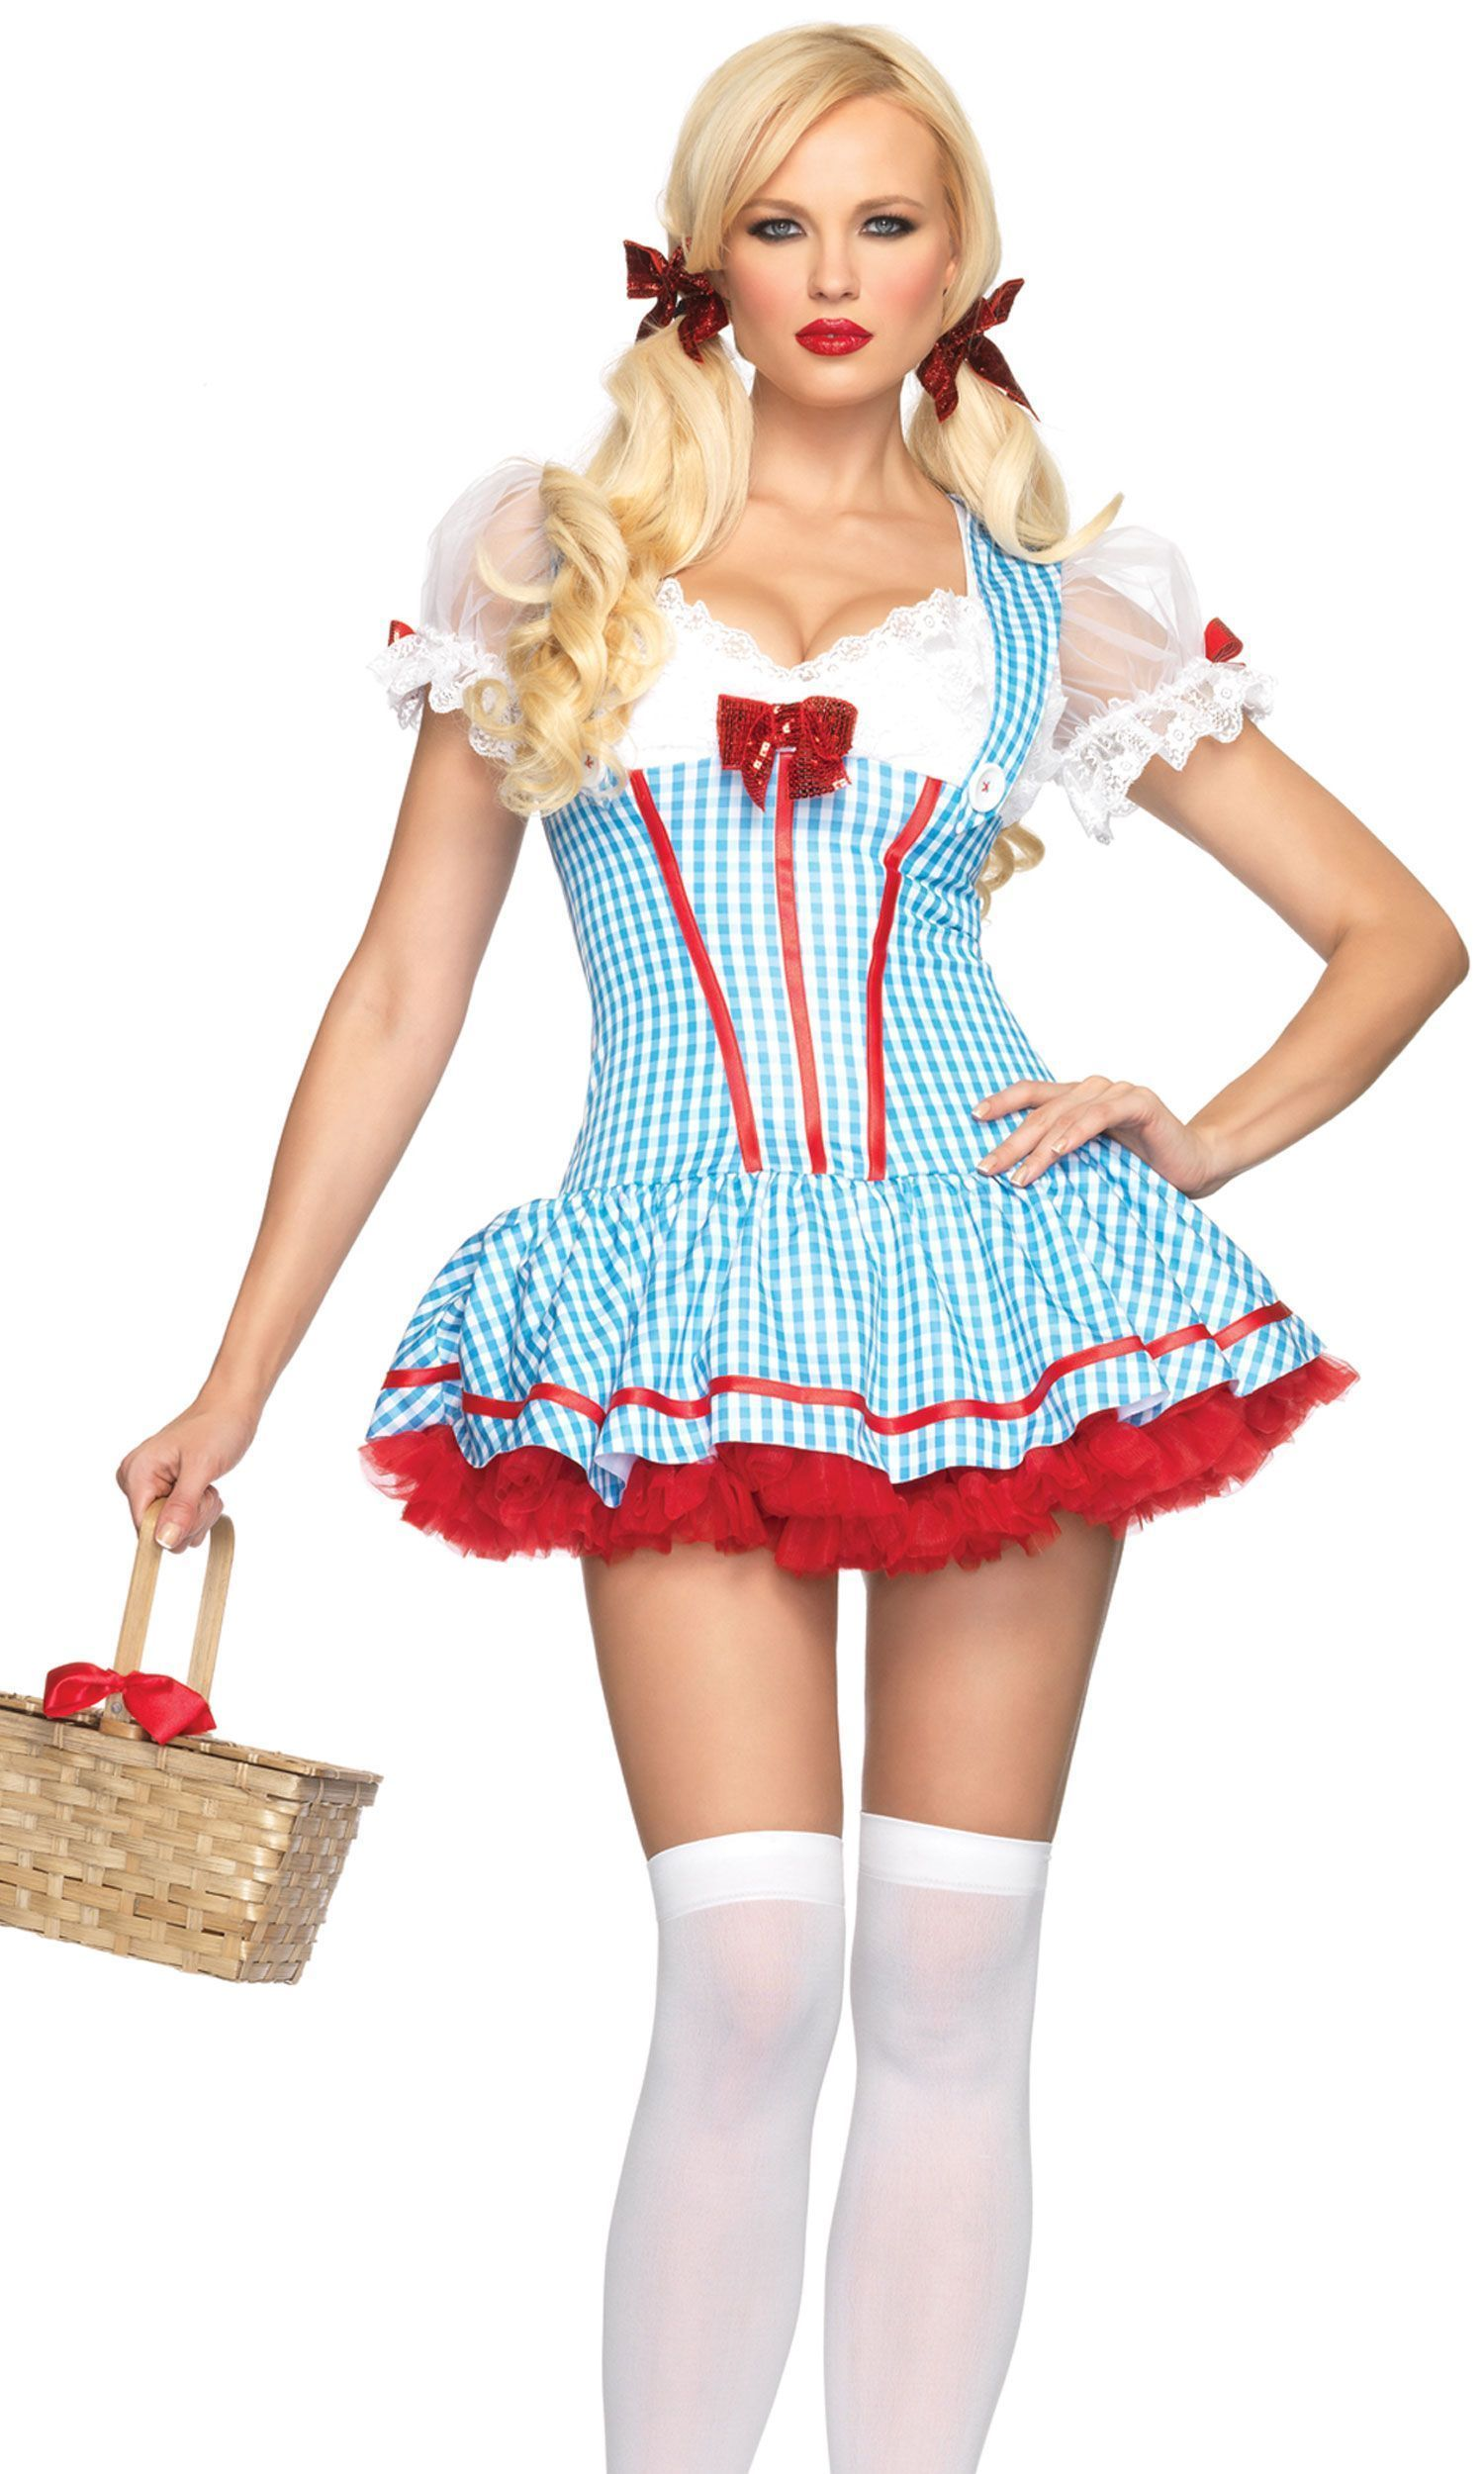 Inventor reccomend Erotic fairy tales costume